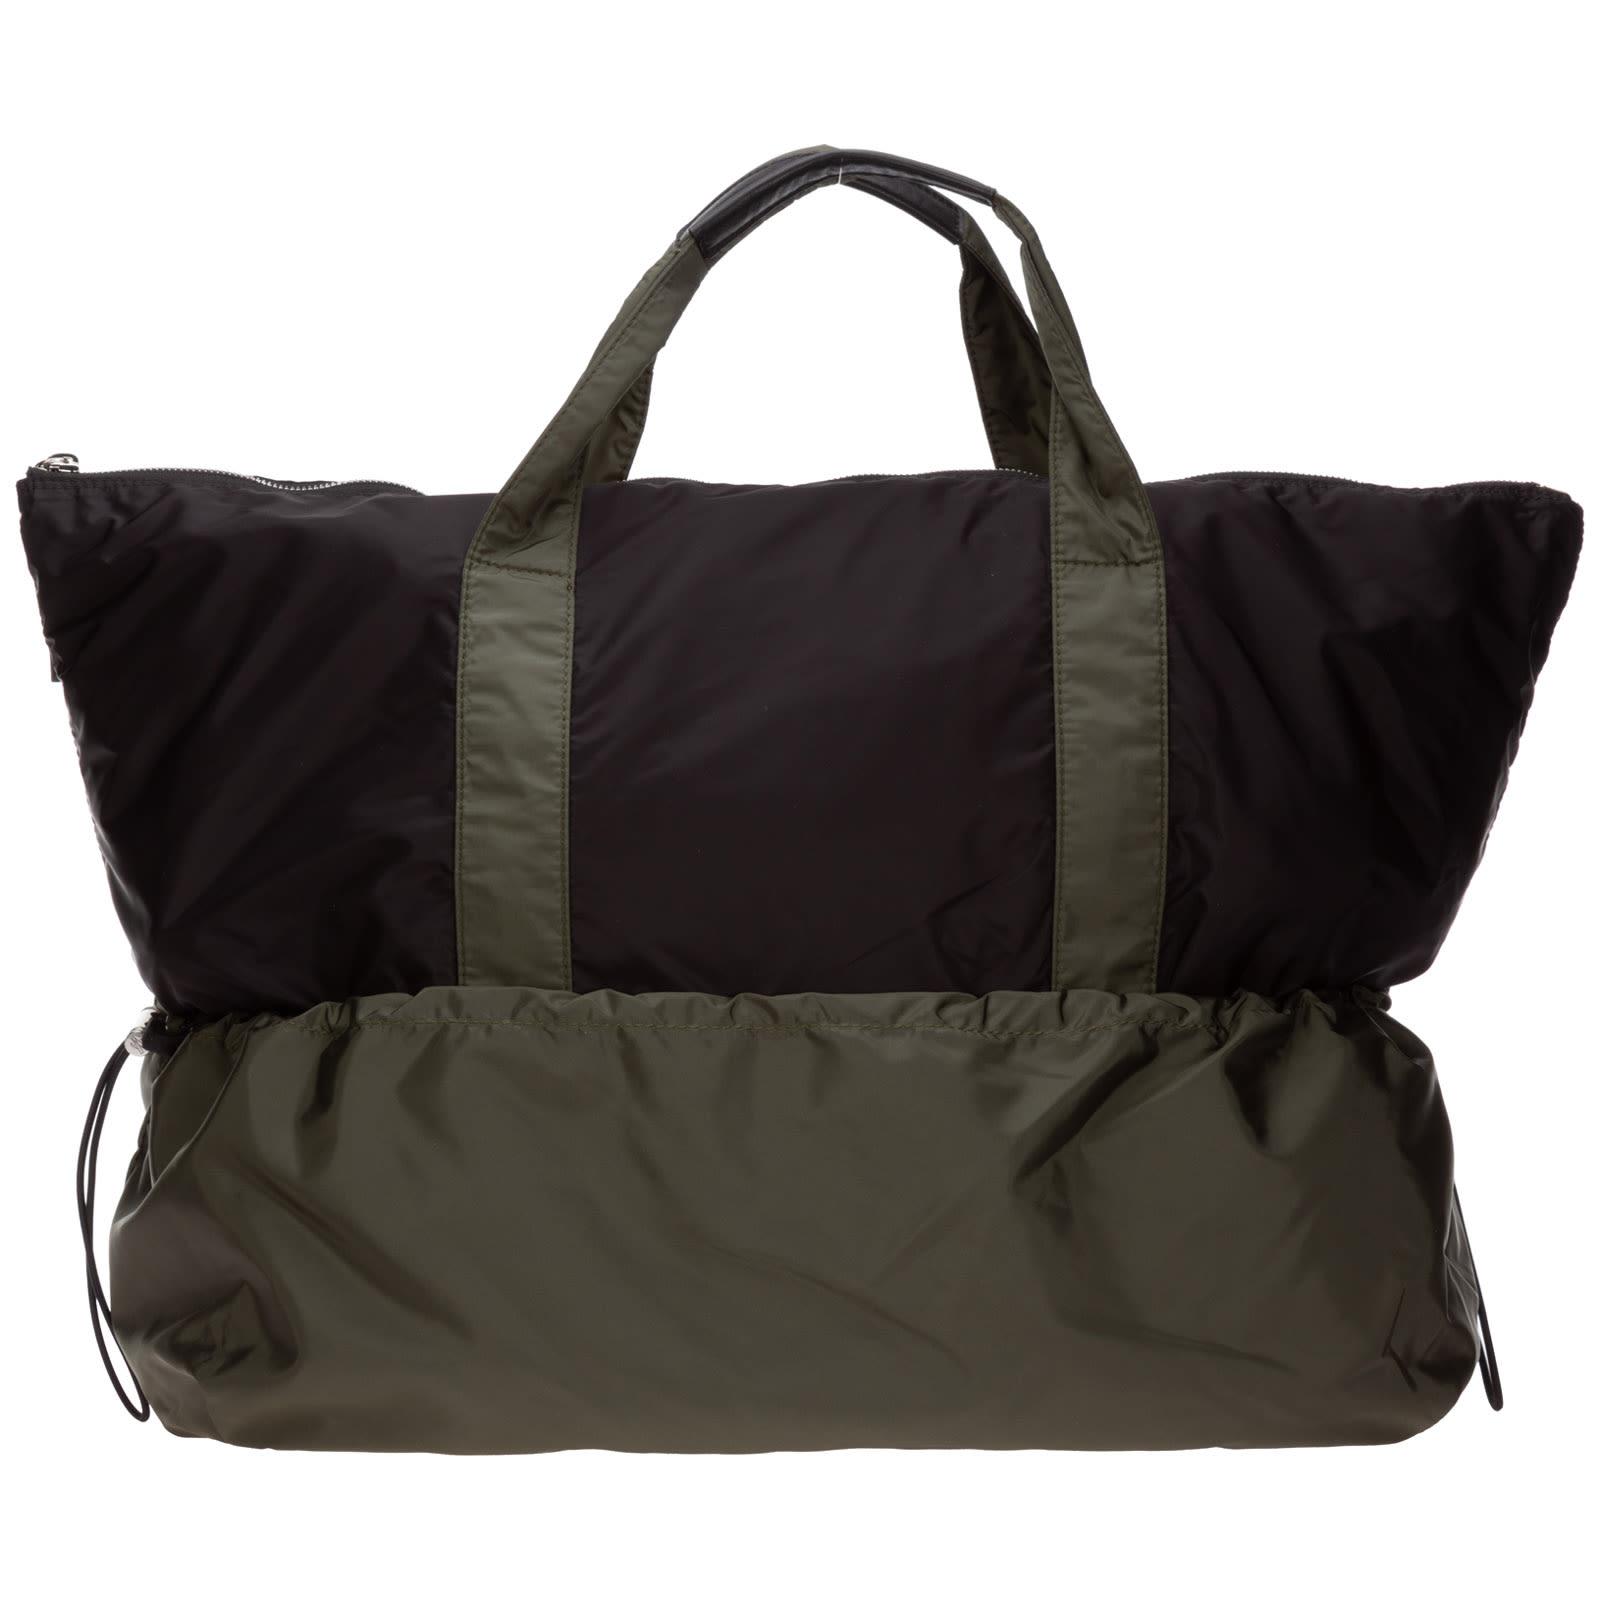 Moncler Genius Tote Shoulder Bag